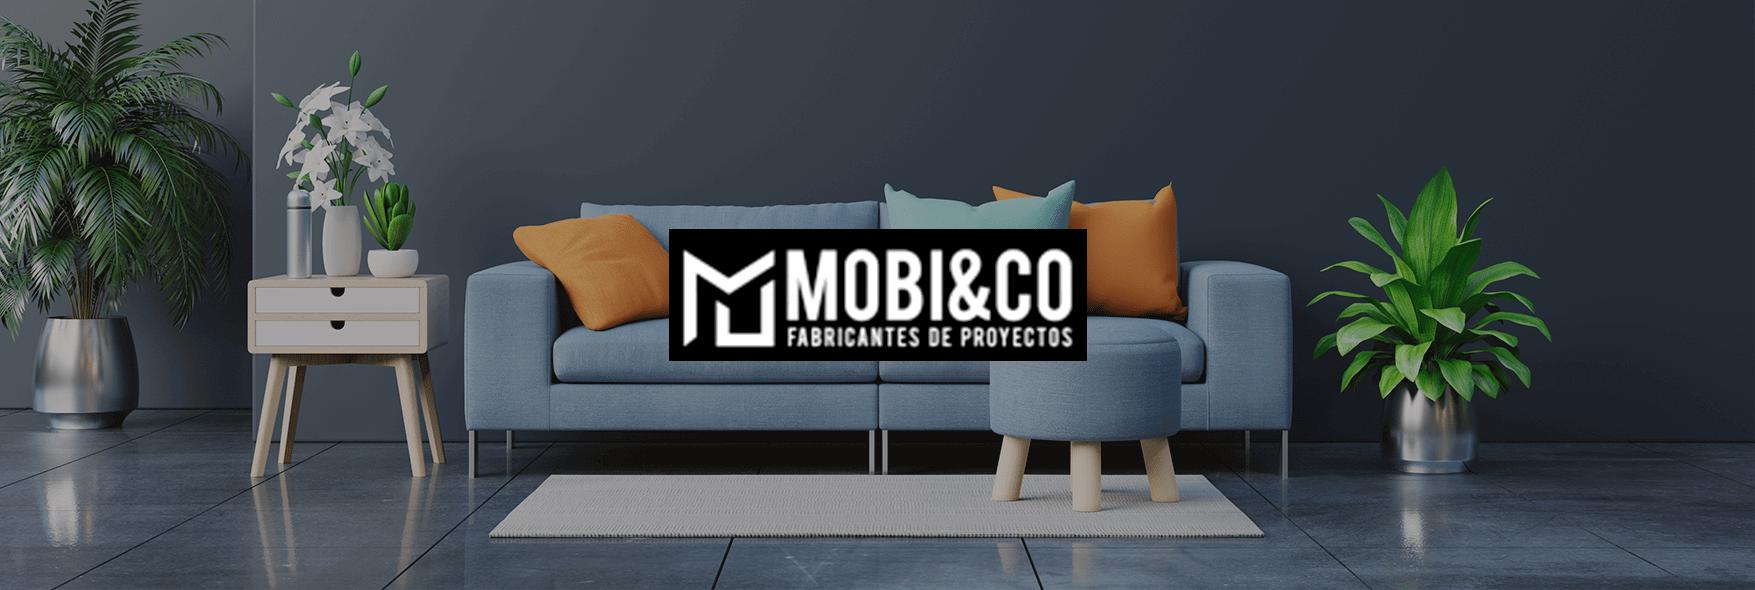 Mobi&Co Fondo